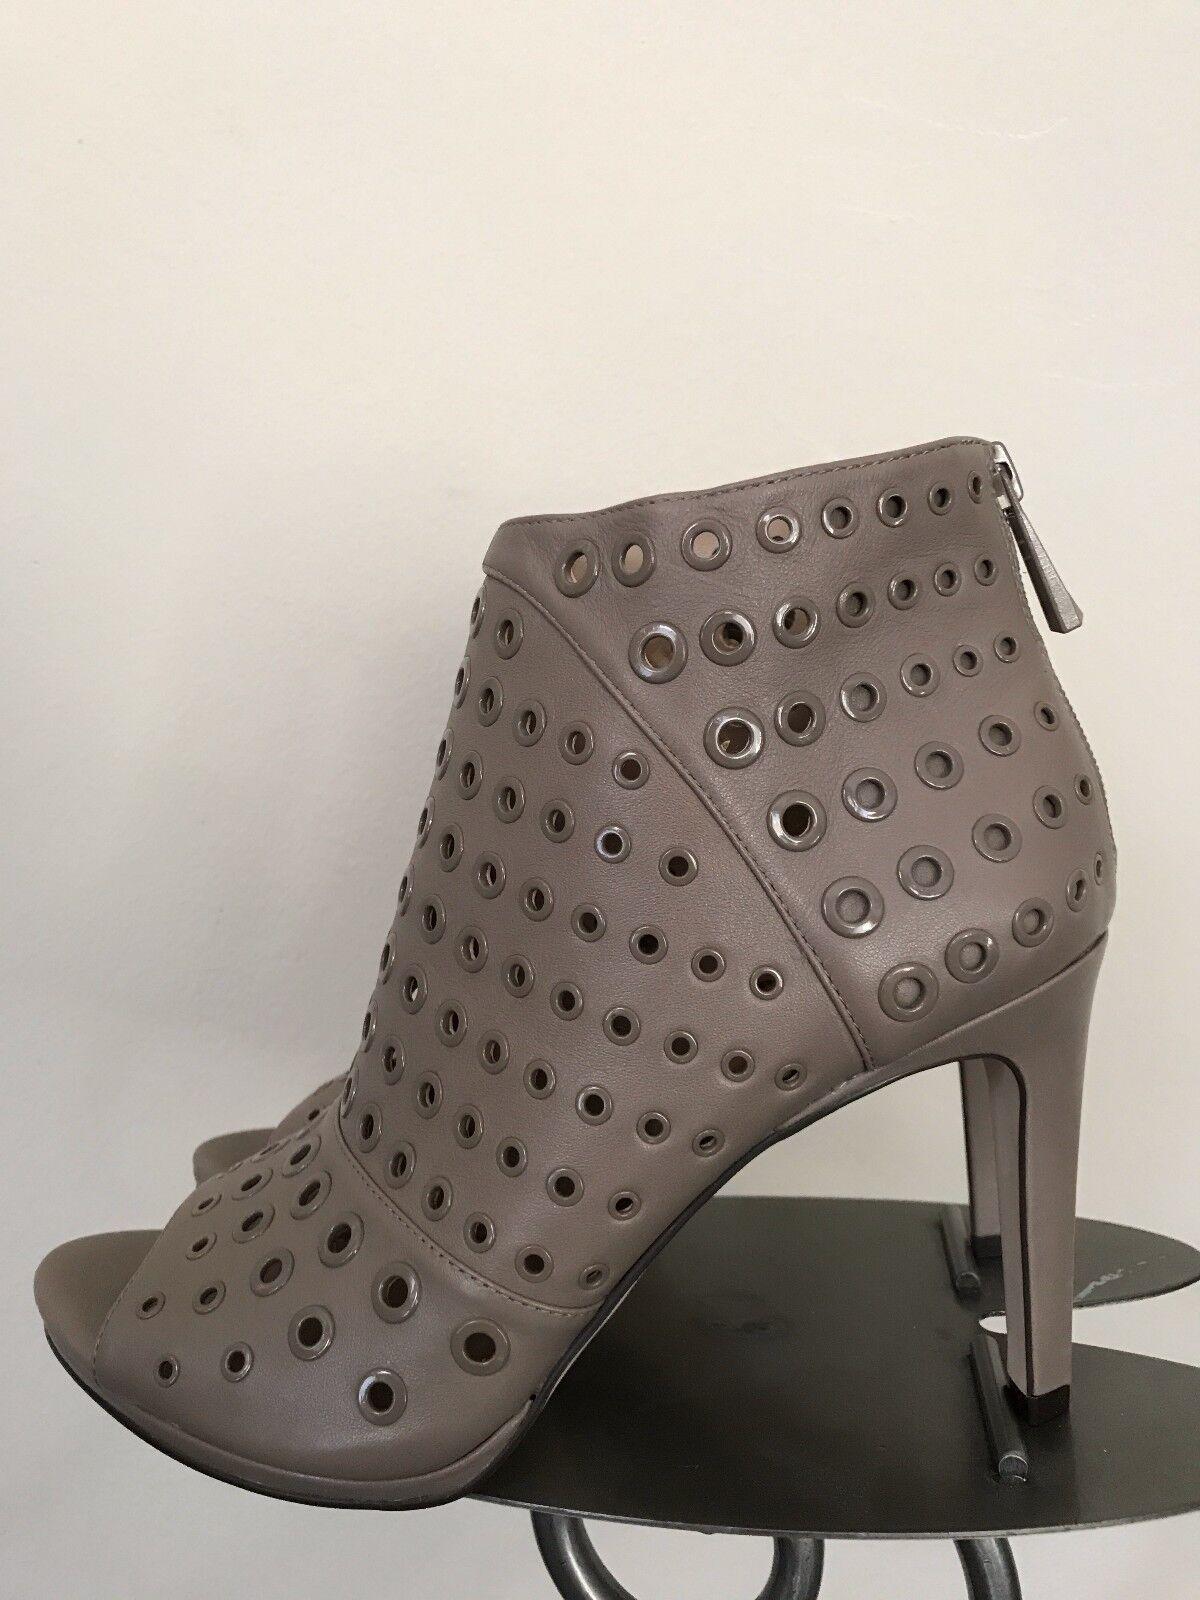 BCBGMAXAZRIA New Desert Sand Grommet Ankle Boot Peep Toe Heel Schuhe Größe 10 NWB